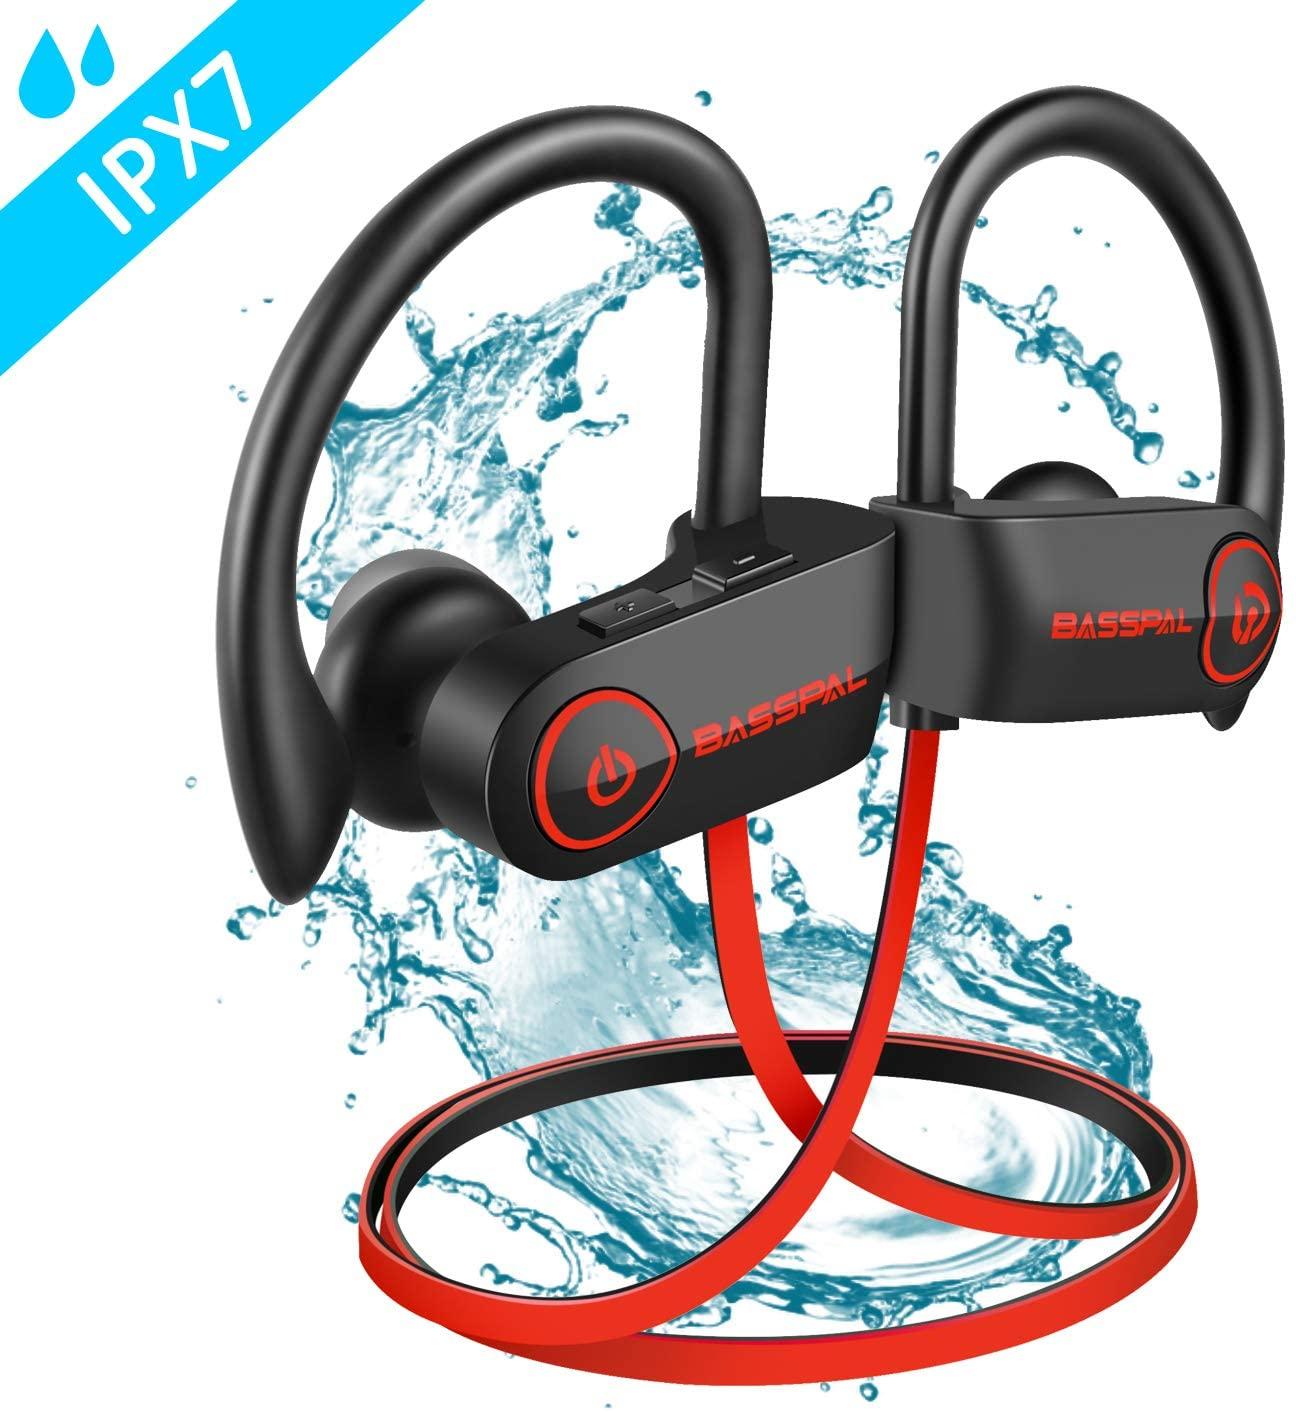 Bluetooth Headphones, BassPal TonePro U14 Wireless Sport Earphones Waterproof IPX7, w/Mic Richer Bass HD Stereo Sweatproof In Ear Earbuds for Gym Running Workout 9 Hrs Battery Noise Cancelling Headset